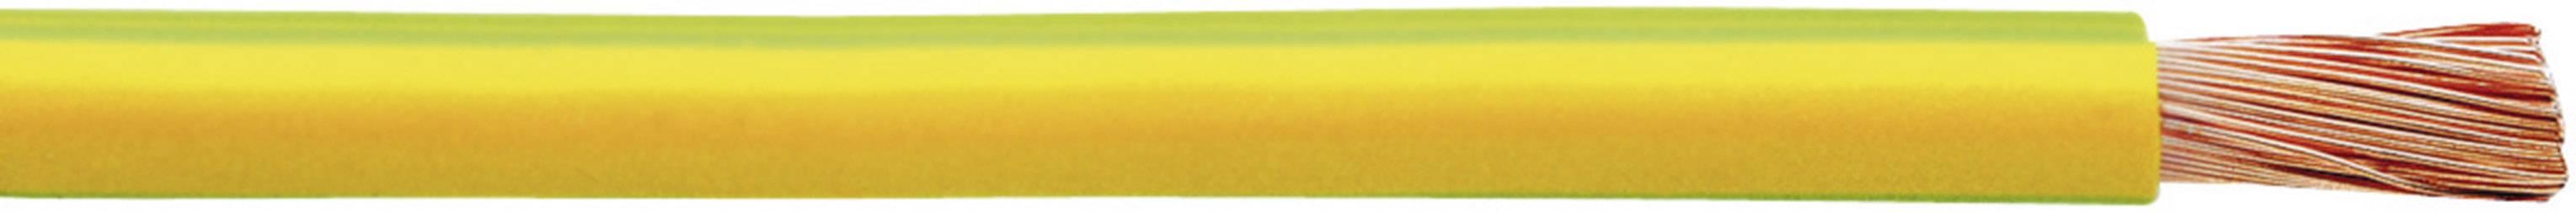 Opletenie / lanko Faber Kabel 040065 H07V-K, 1 x 4 mm², vonkajší Ø 3.90 mm, 100 m, hnedá